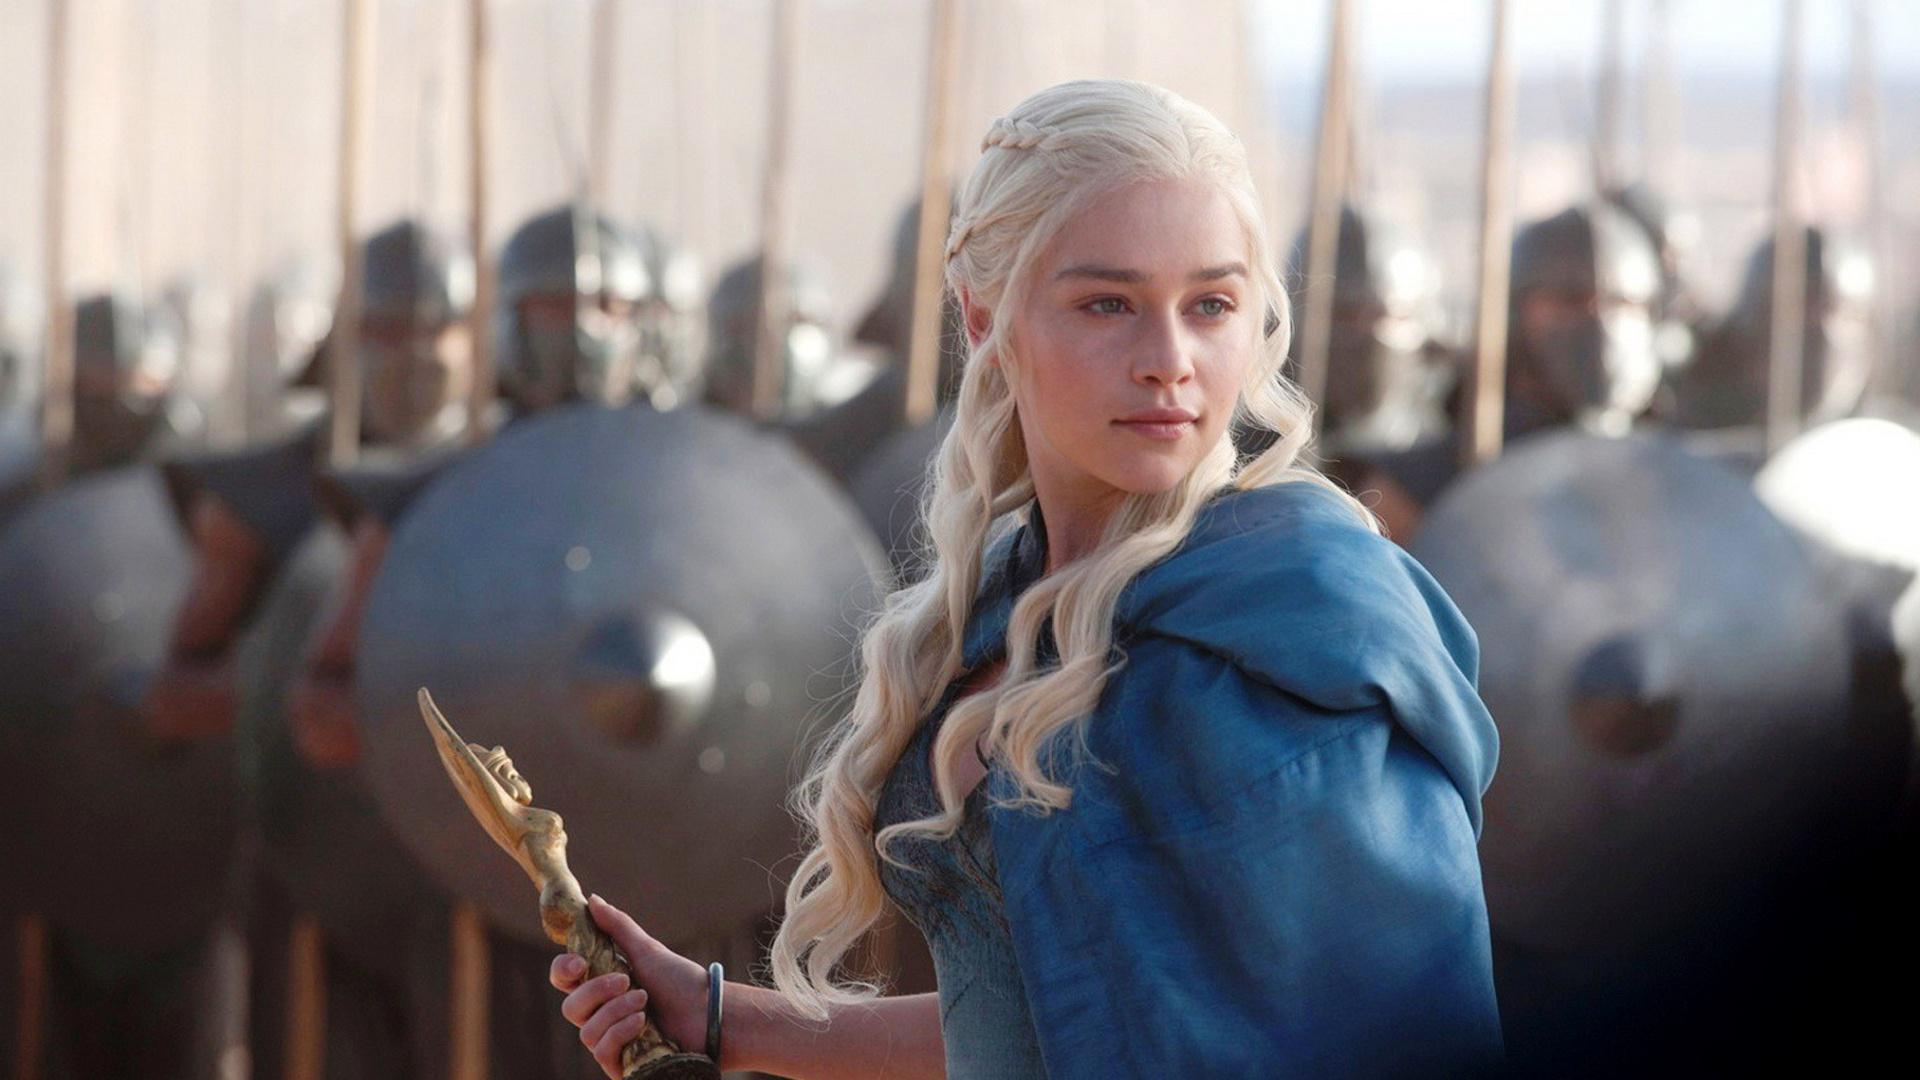 game-of-thrones-daenerys-targaryen-emilia-clarke.jpg